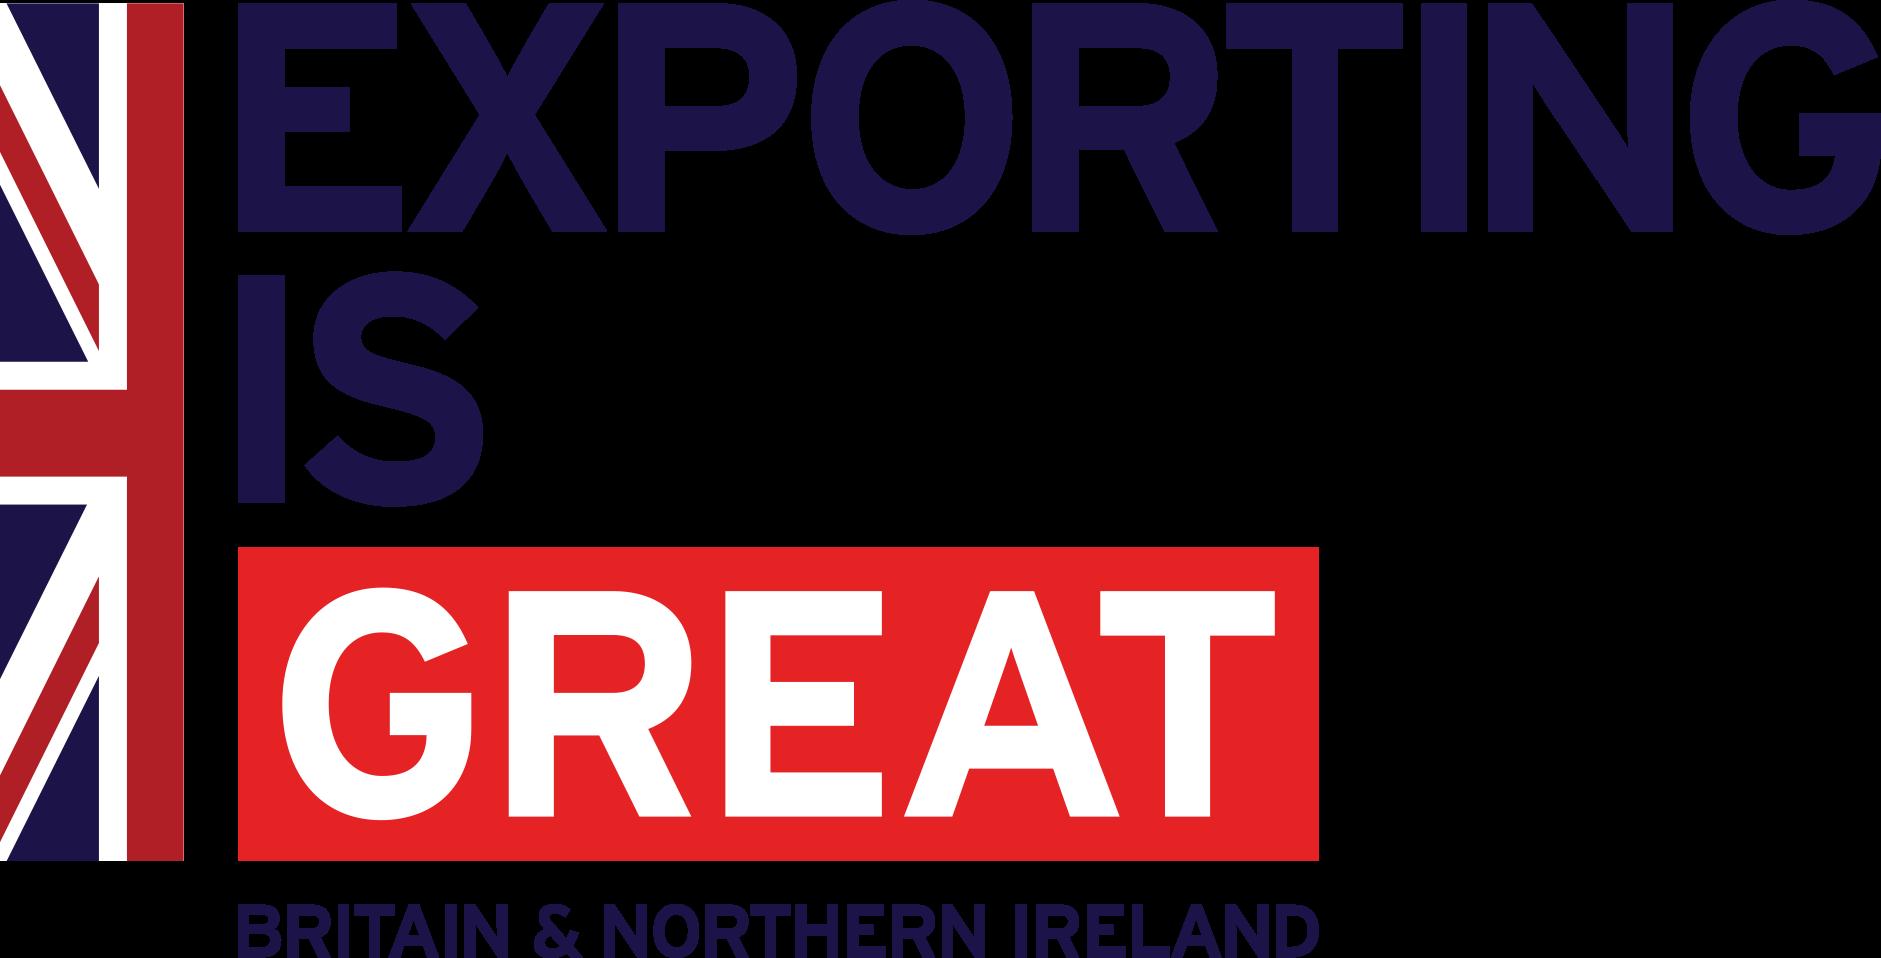 Exporting_Is_Great_UK_logo.jpg